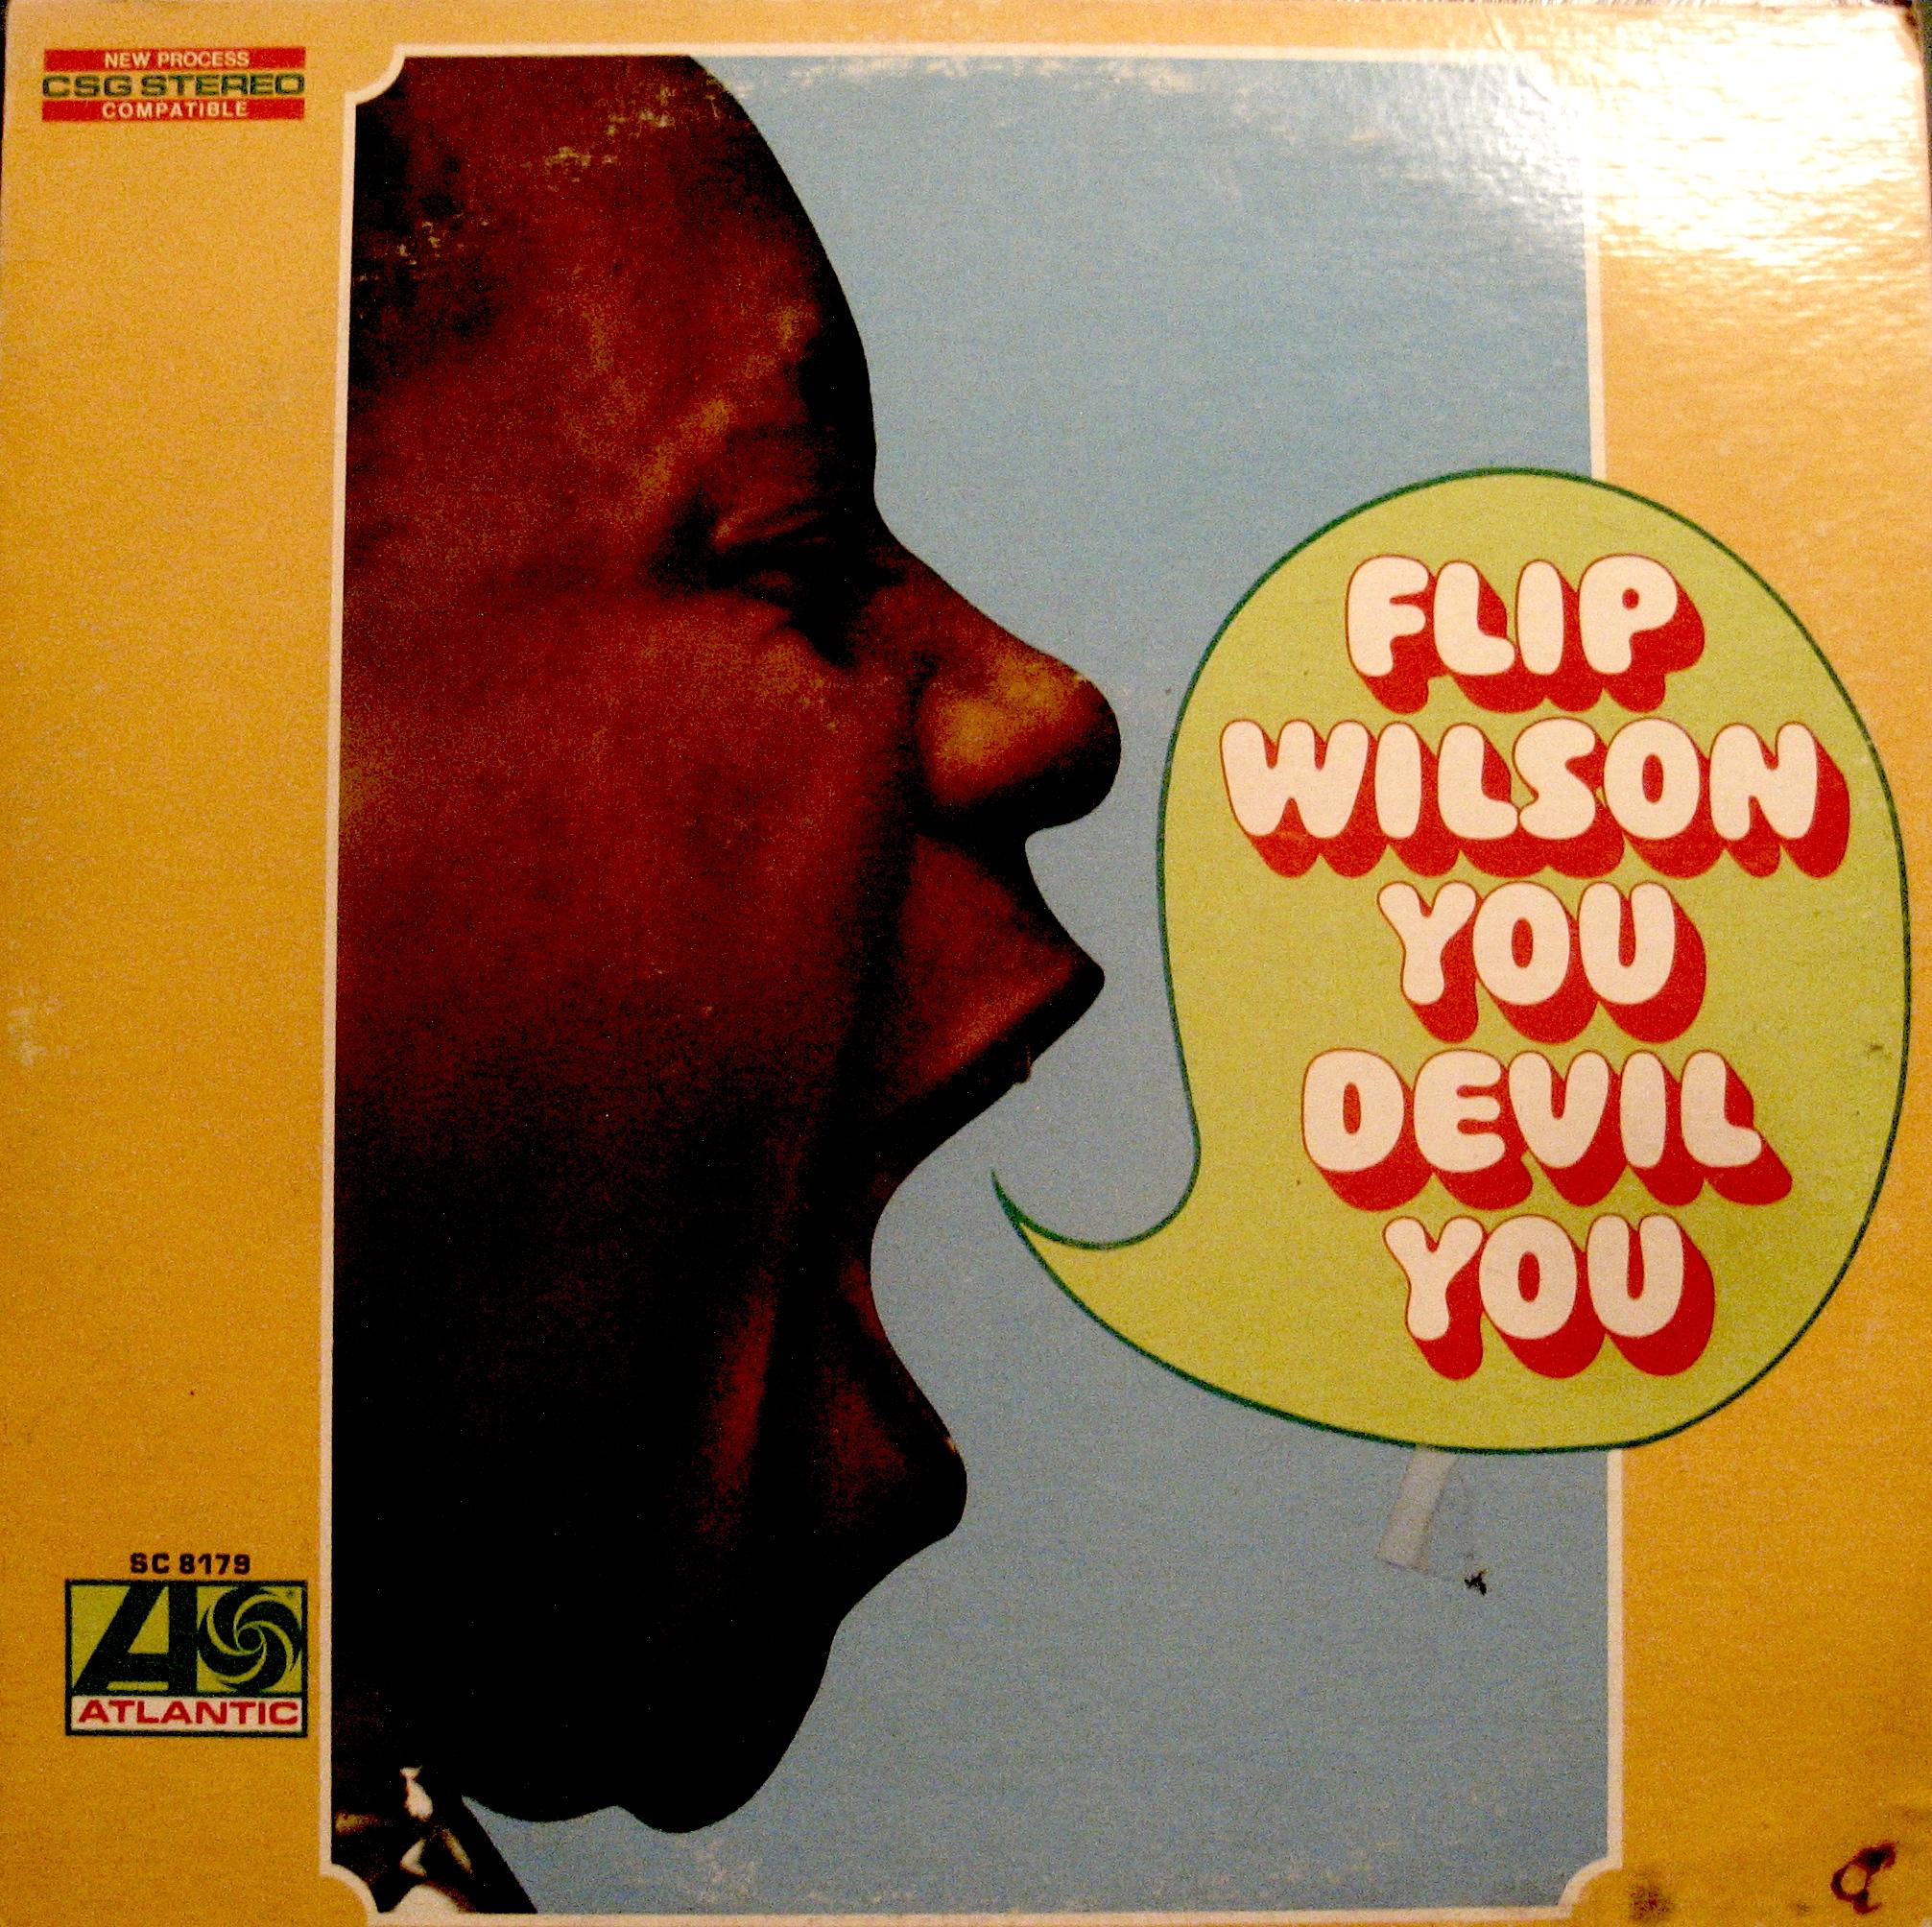 "Flip WIlson ""You Devil You"" album cover"